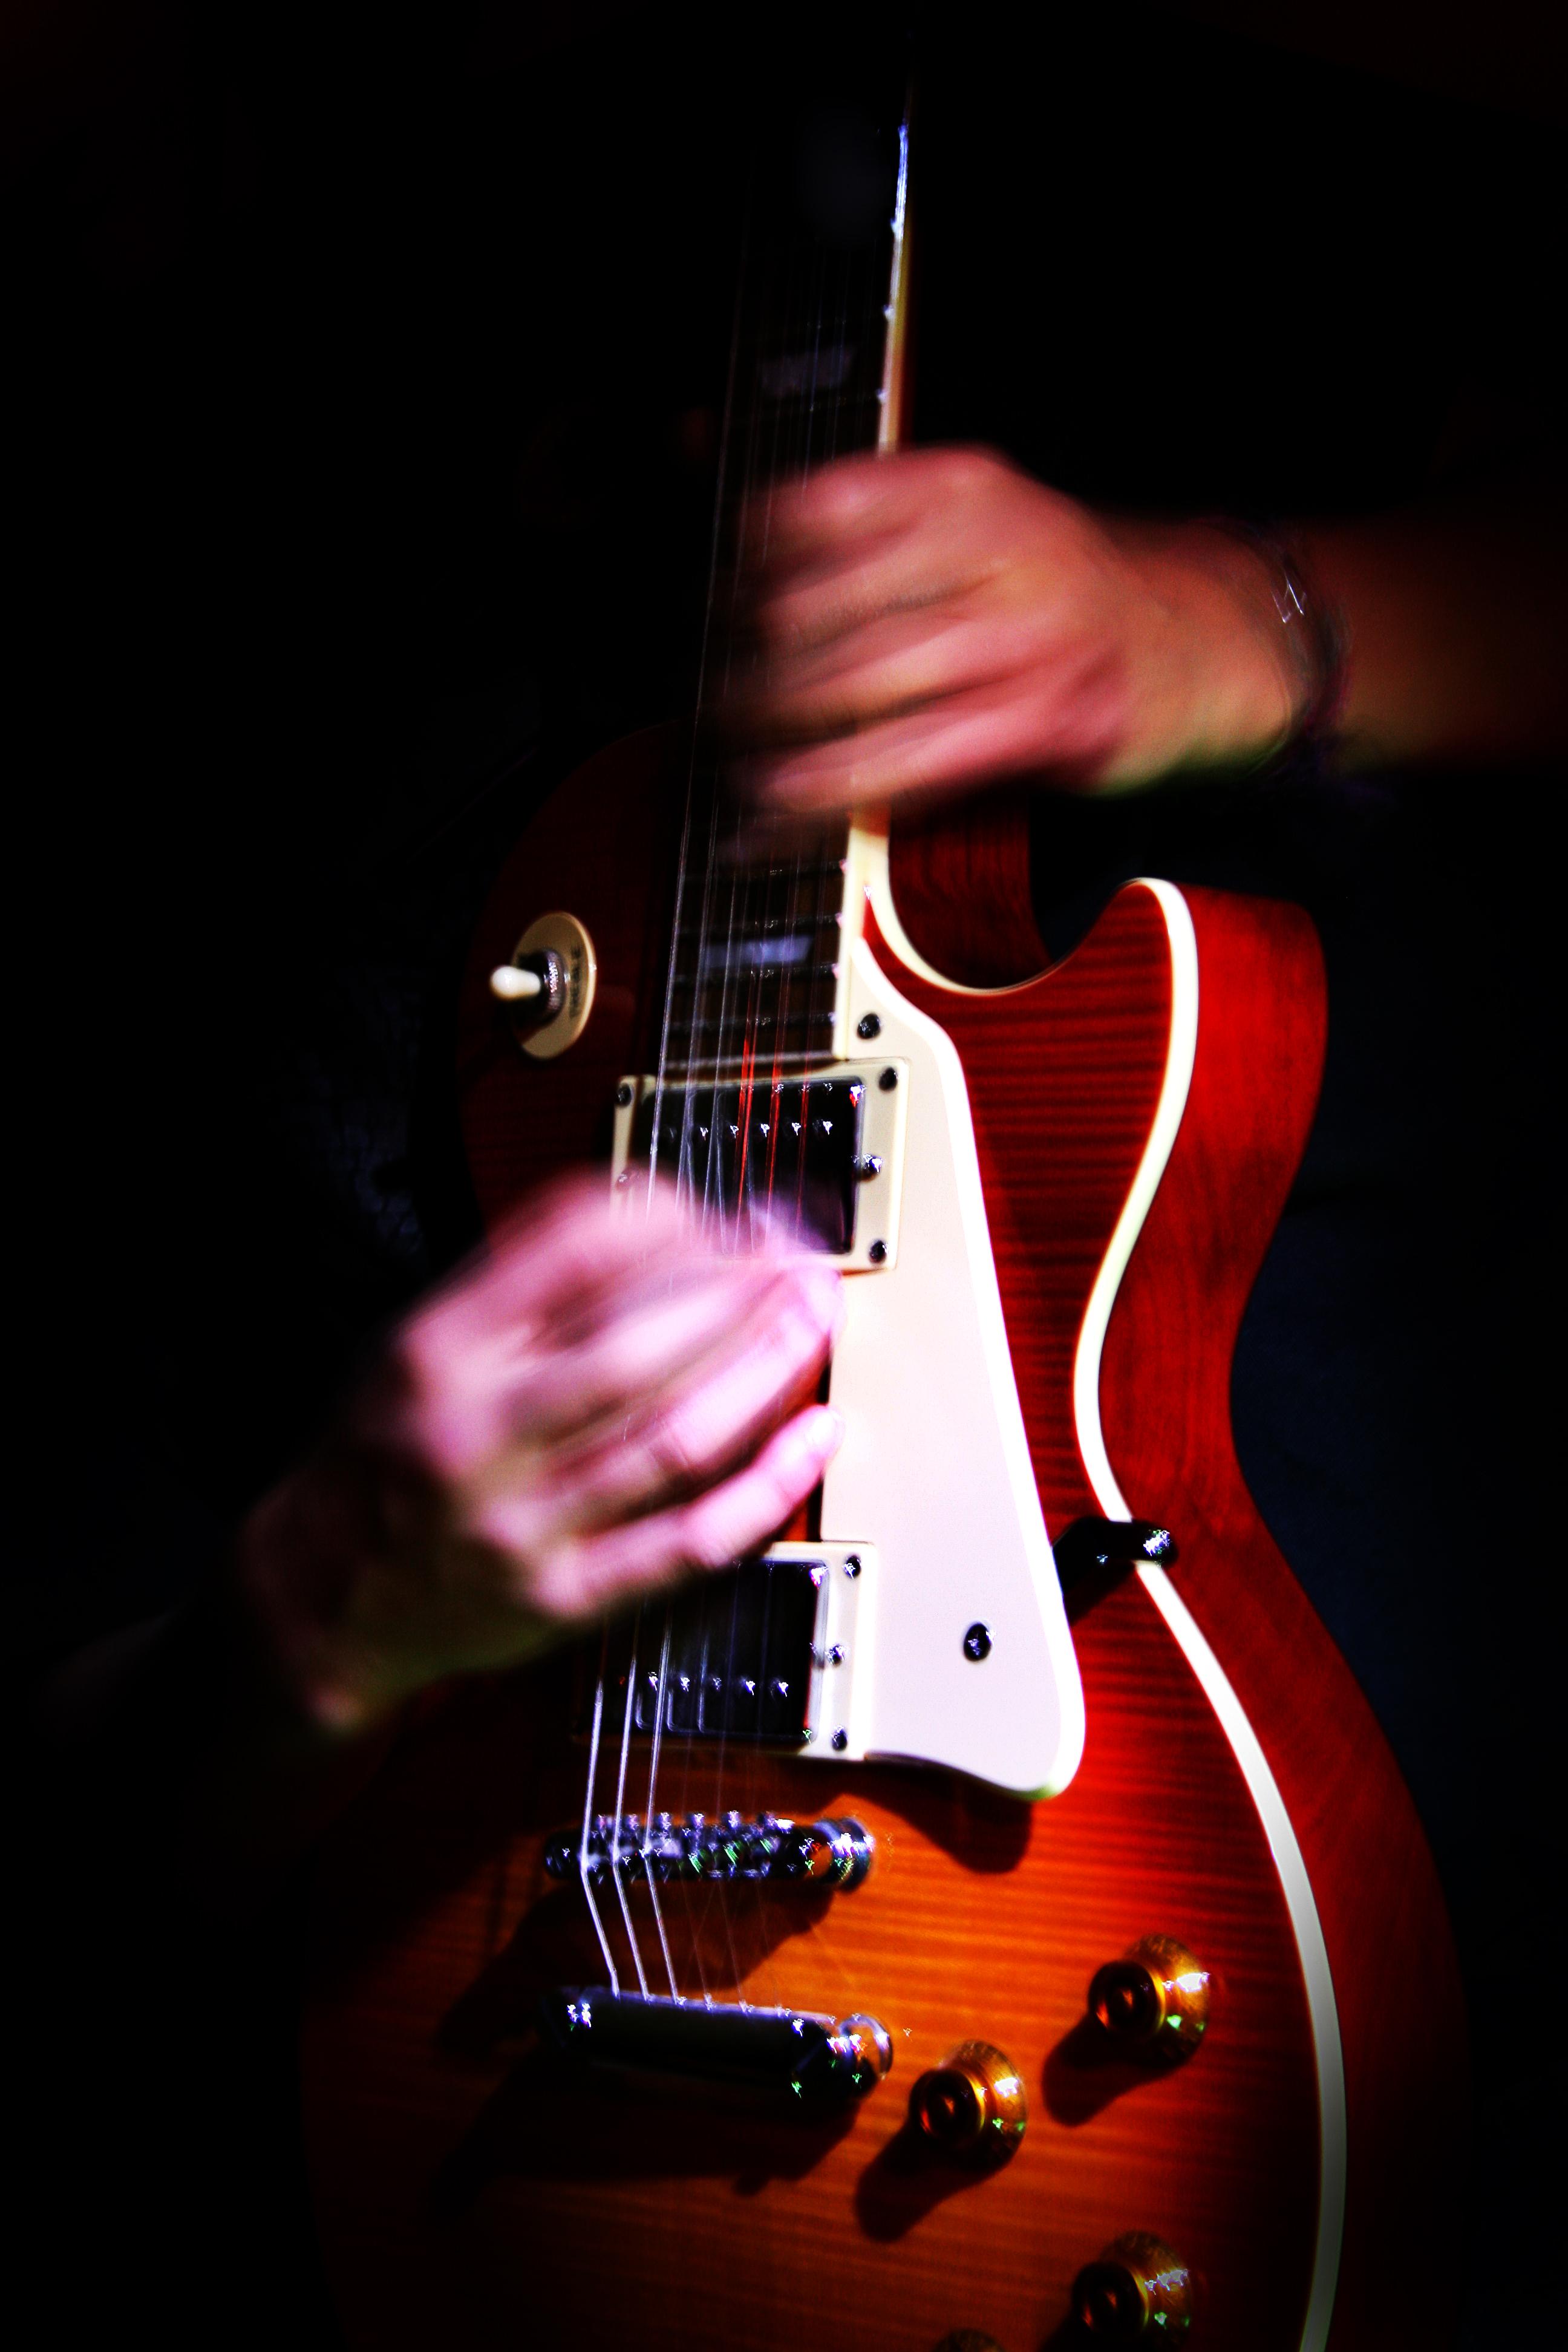 Gibson Gibson Les Paul Guitars Free Wallpaper Wallpaperjam Com